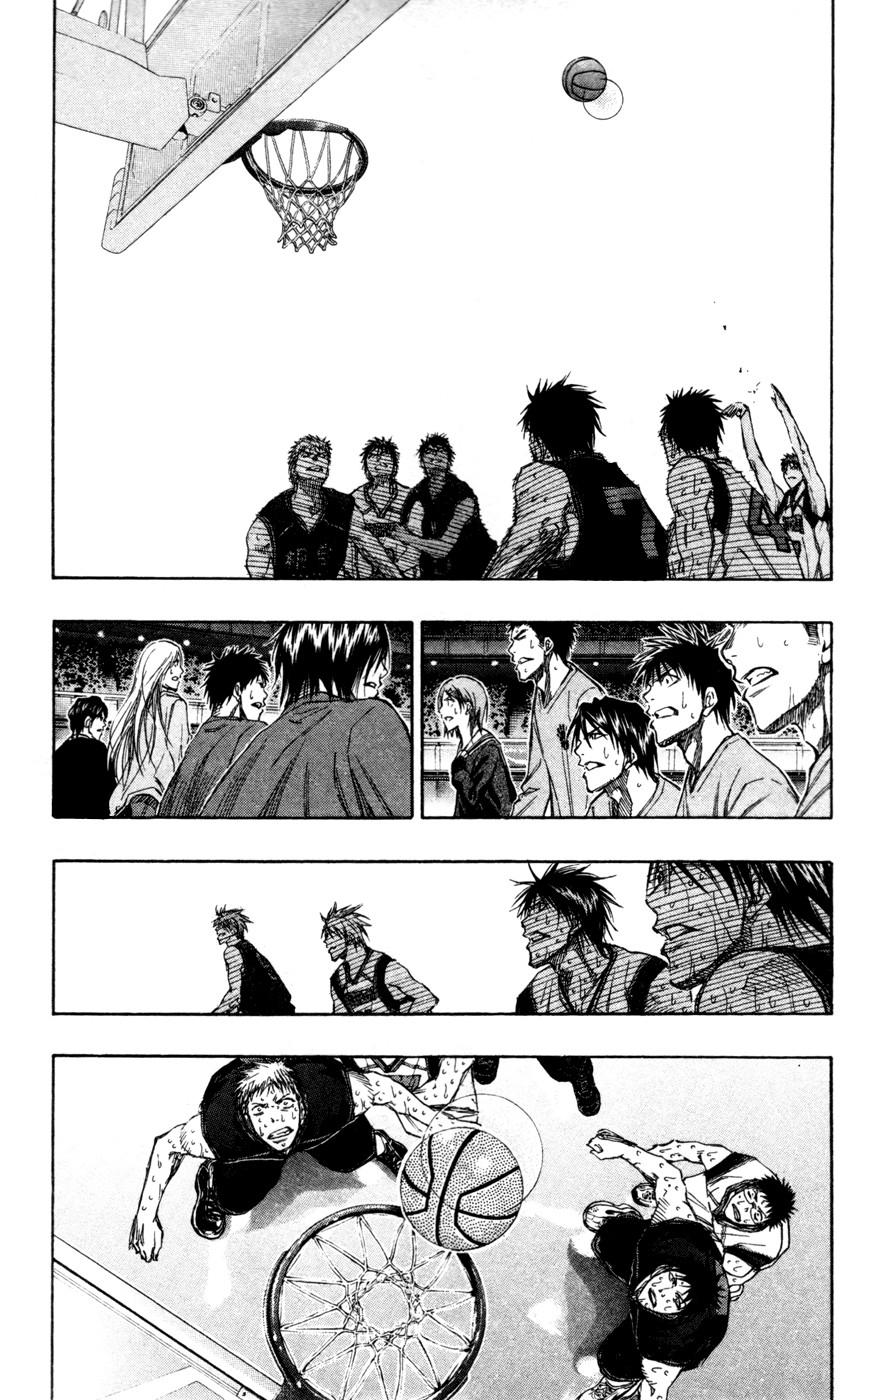 Kuroko no Basket Manga Chapter 138 - Image 11